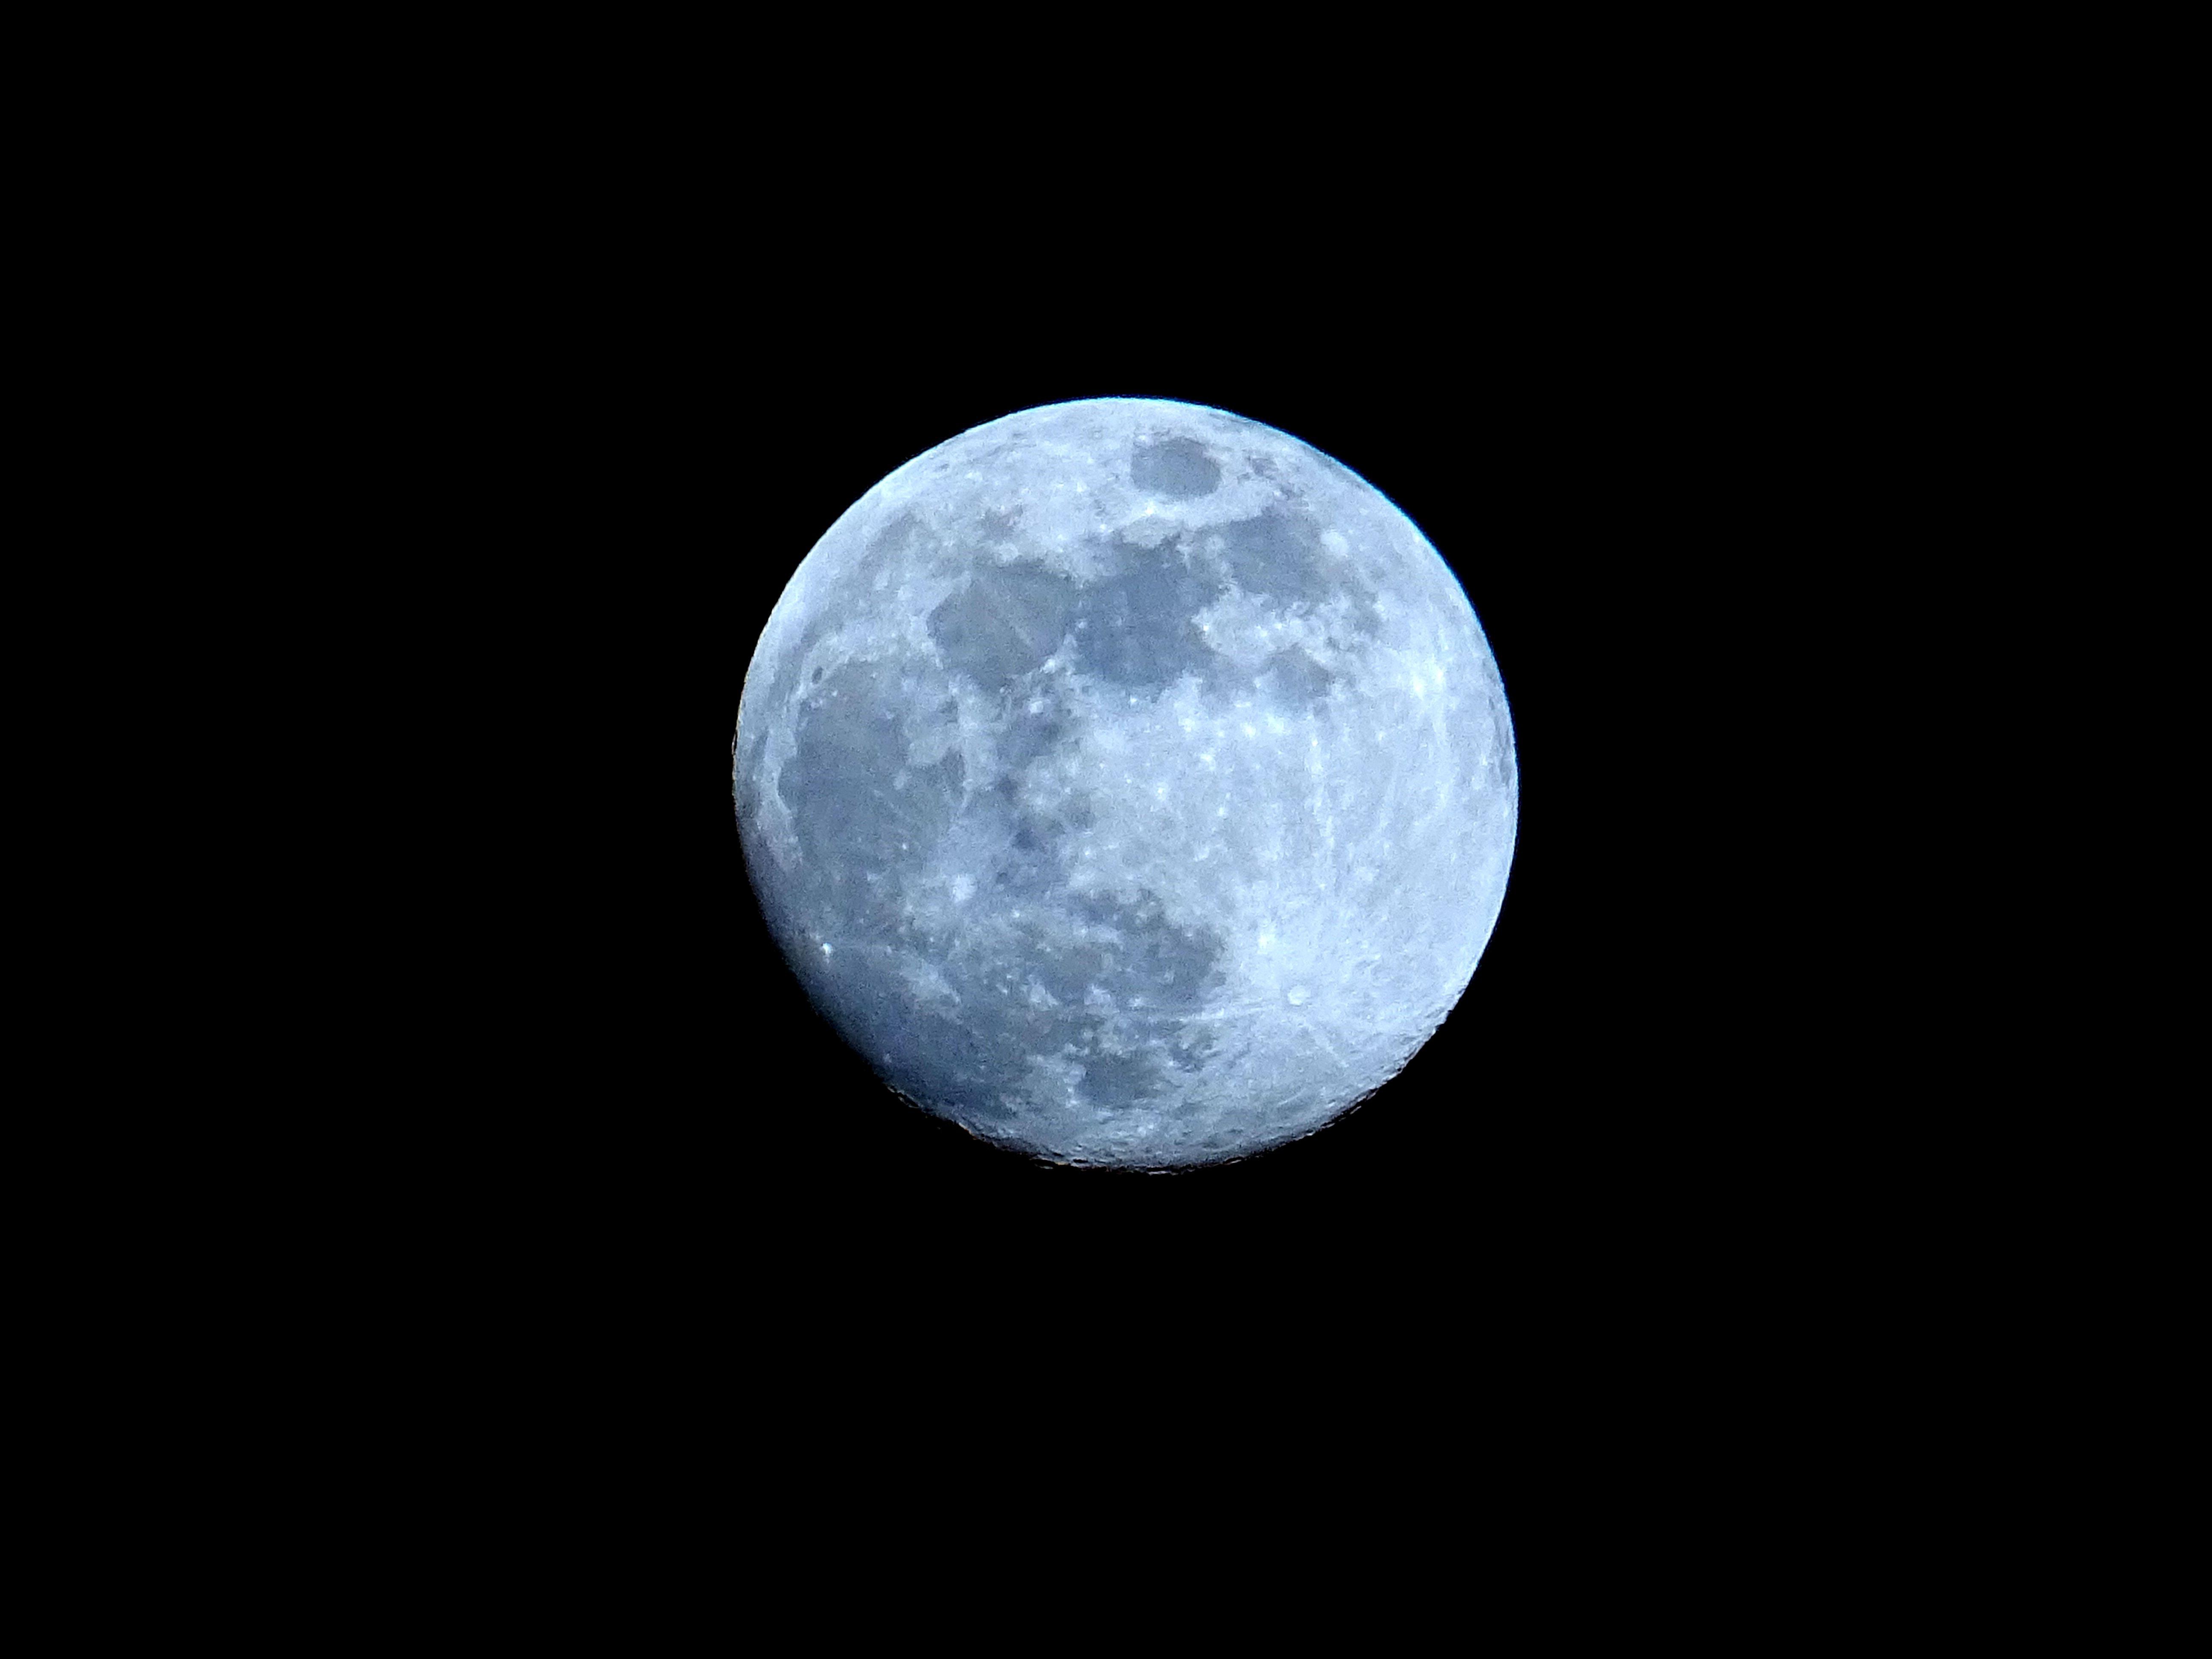 Full Moon Illustration 183 Free Stock Photo